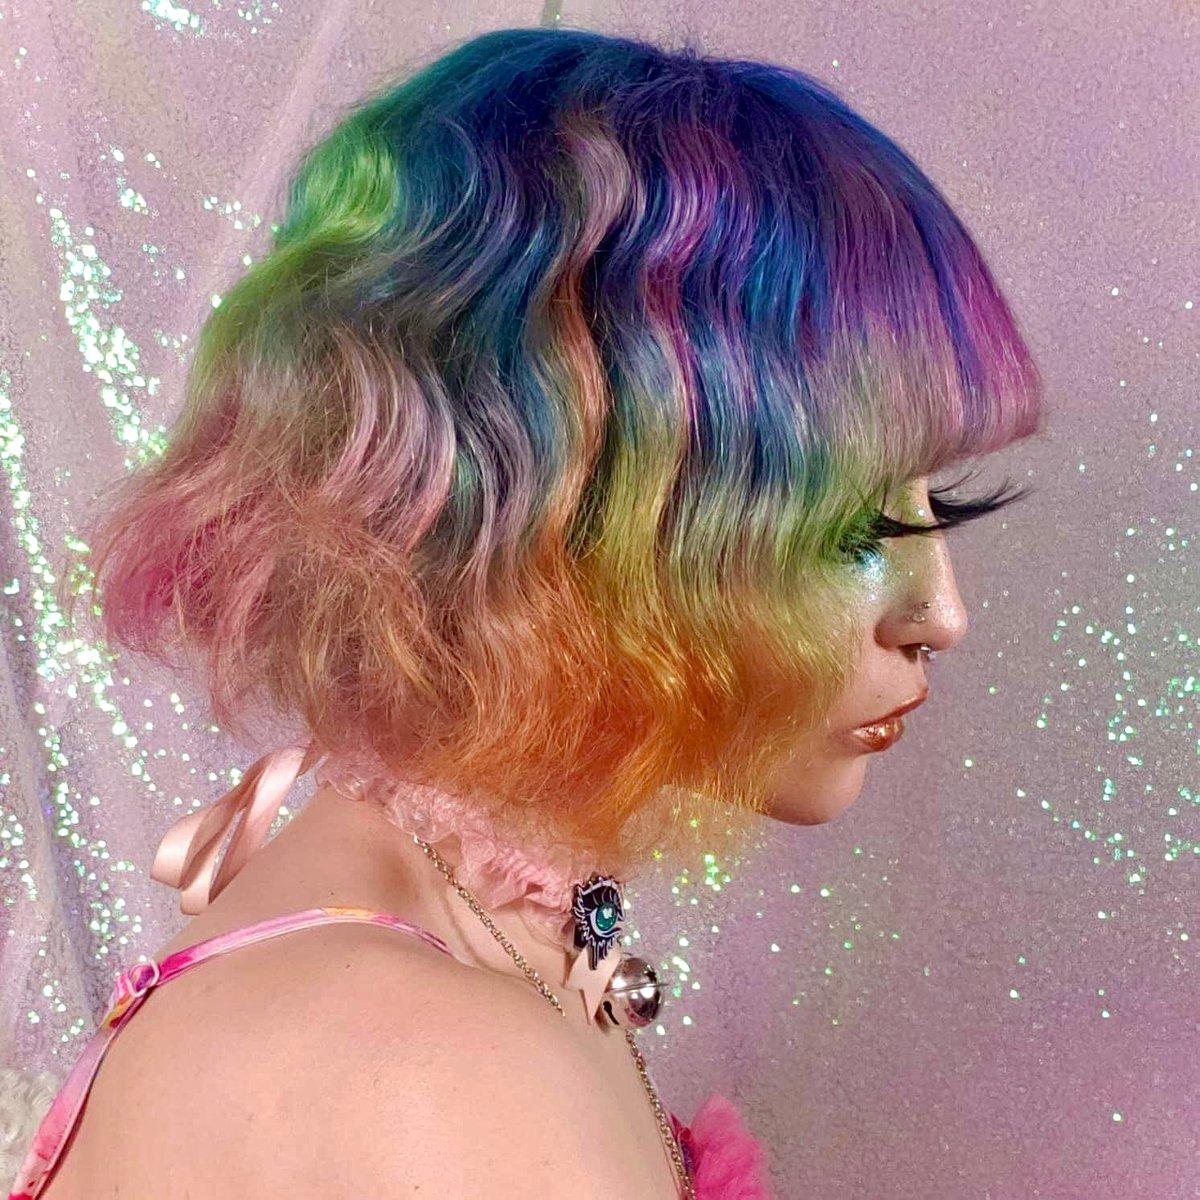 Image of Muted Rainbow Human Hair Wig